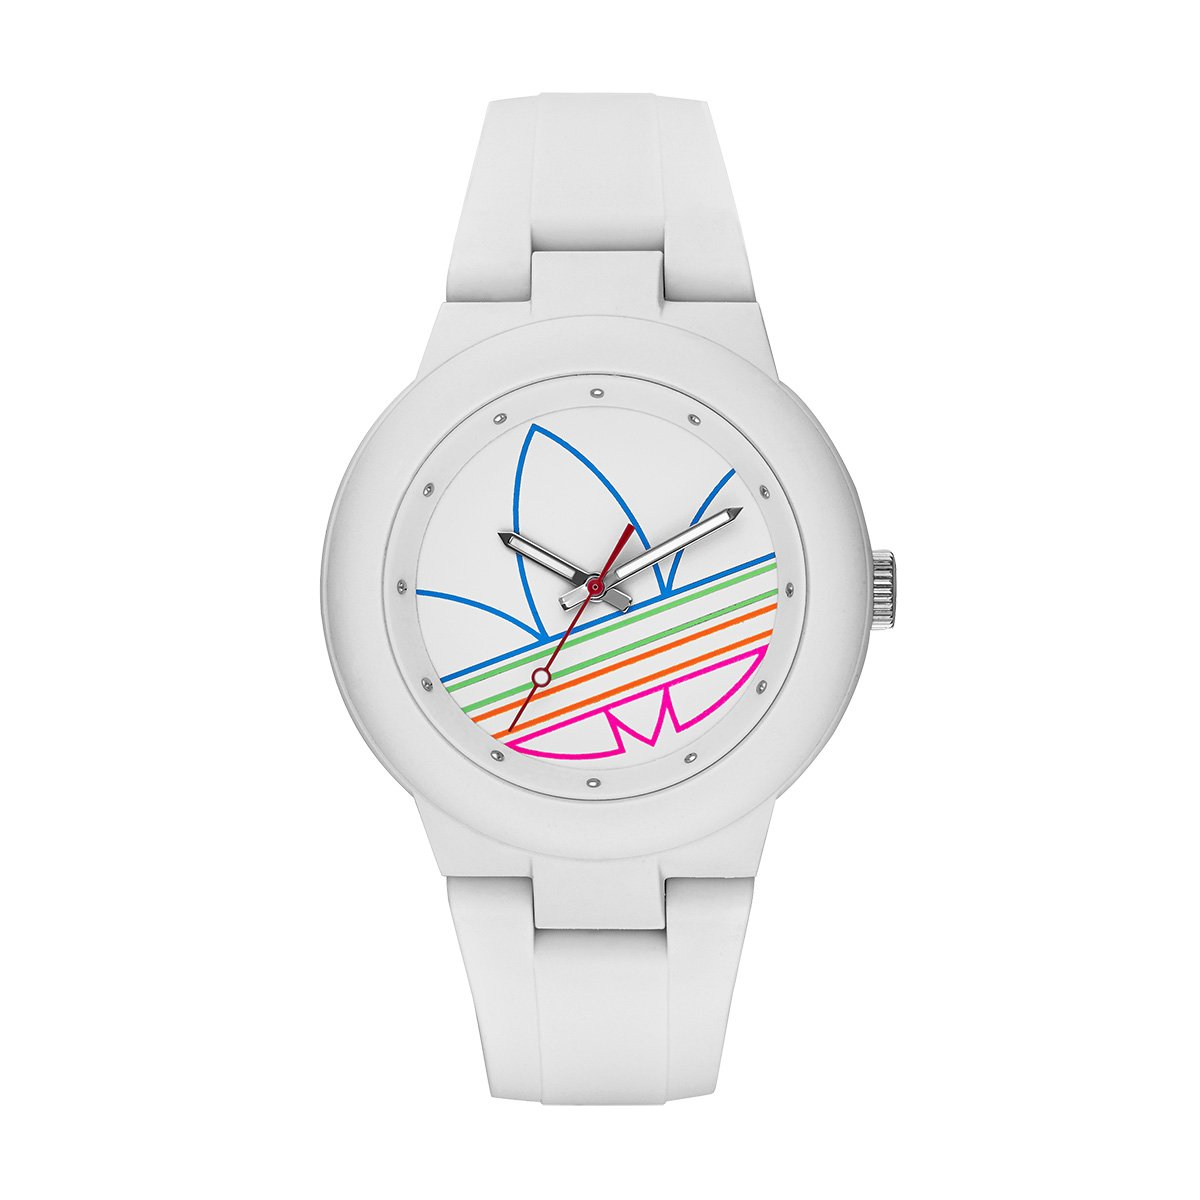 Reloj Dama Adidas Adh3015